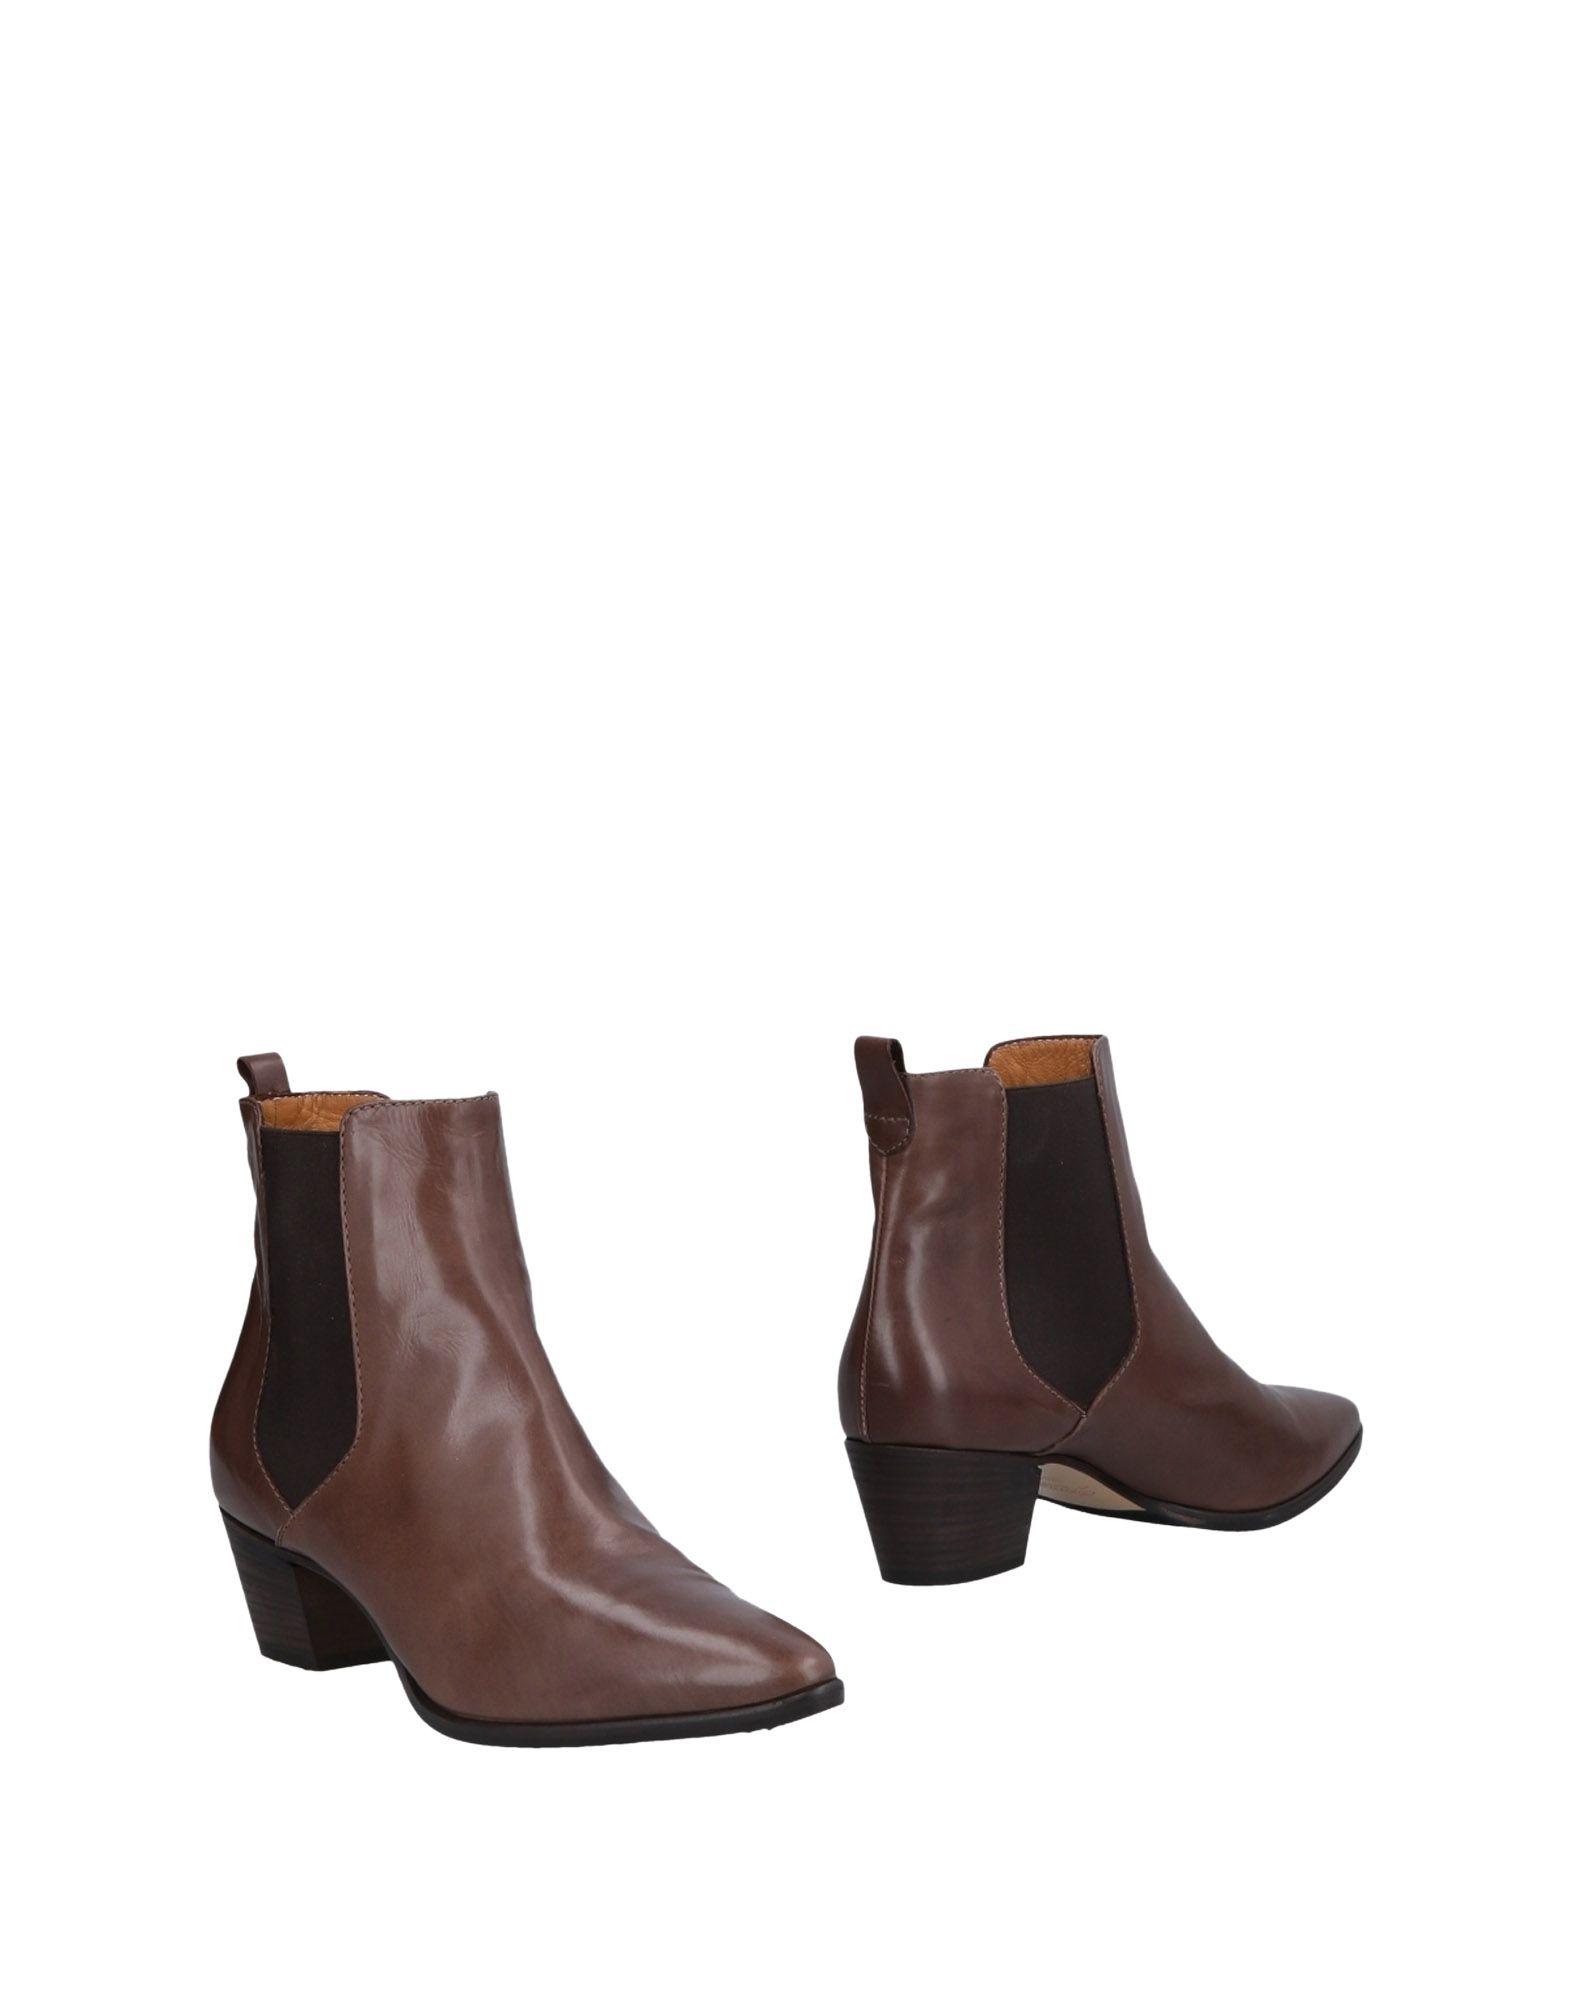 Chelsea Boots Franca Donna - 11472005SC